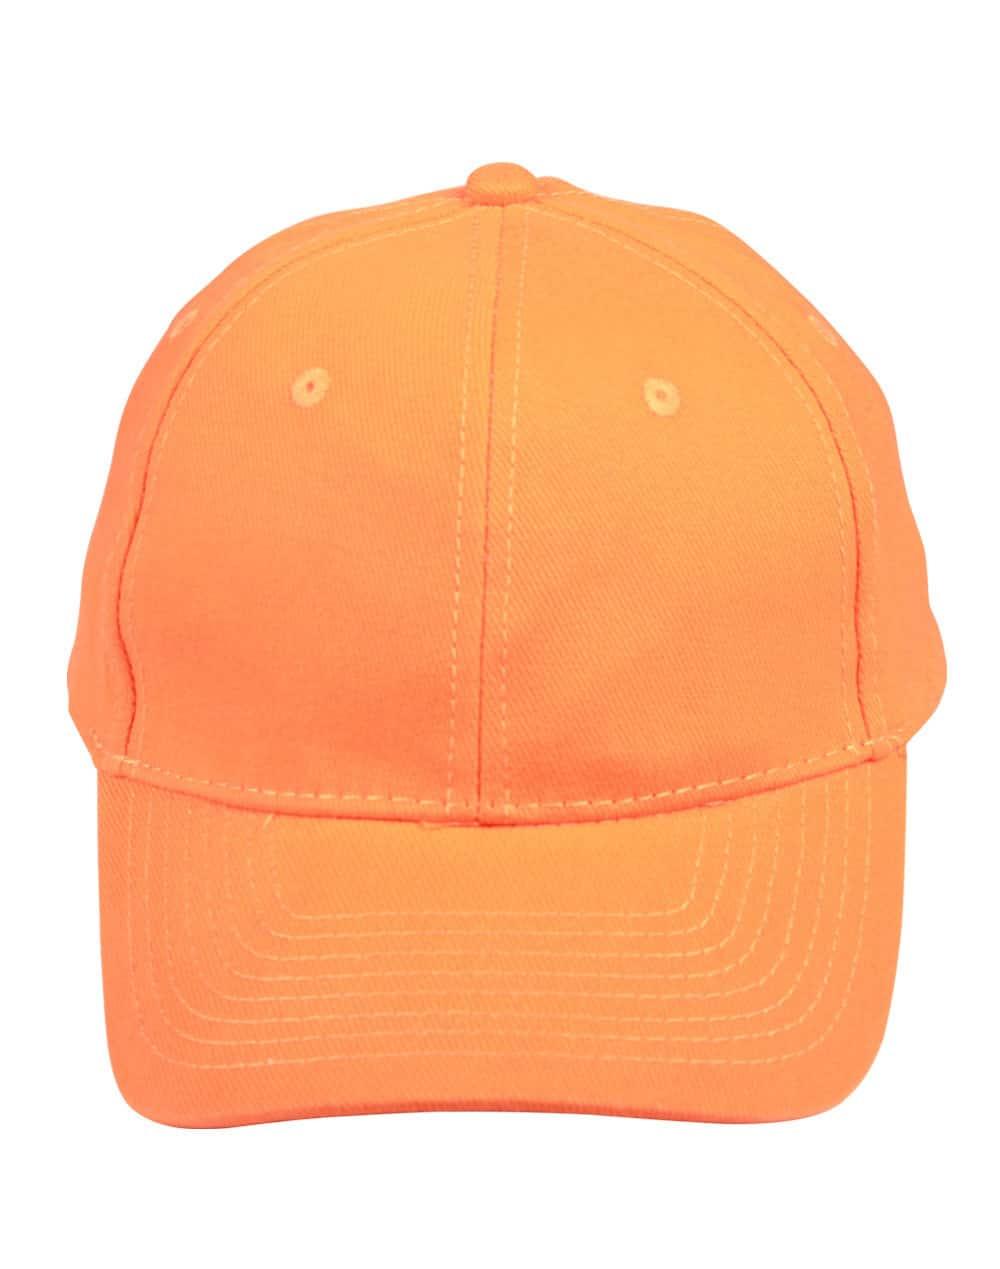 Orange Heavy Brushed Cotton Cap